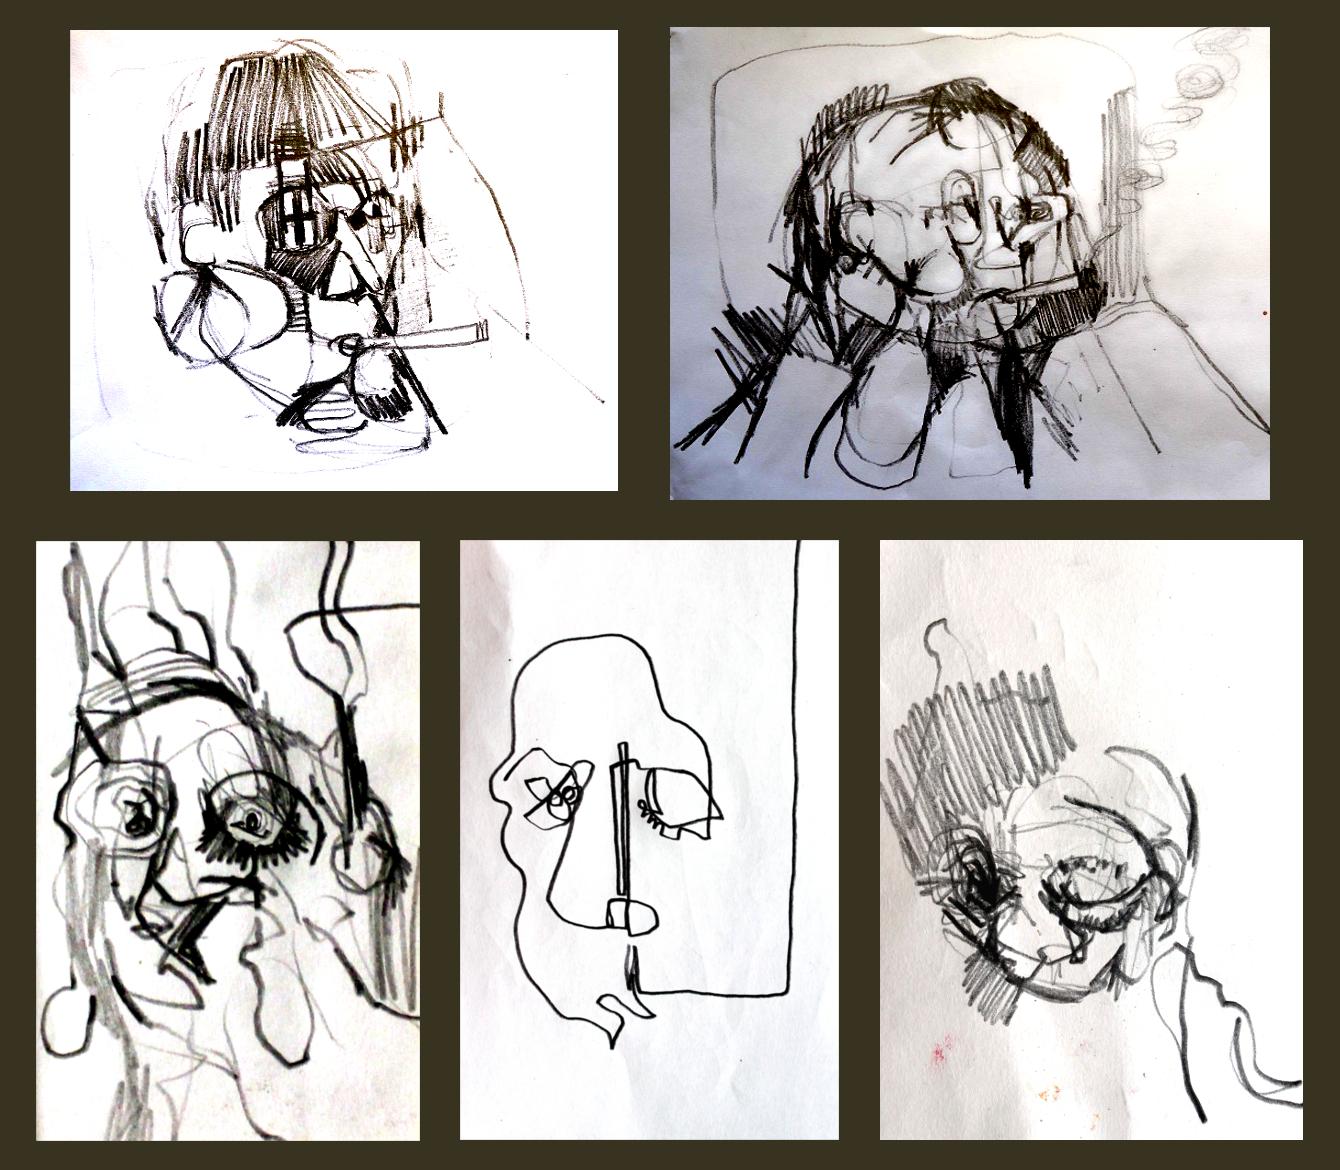 Untitled (heads xxi - xxiv)